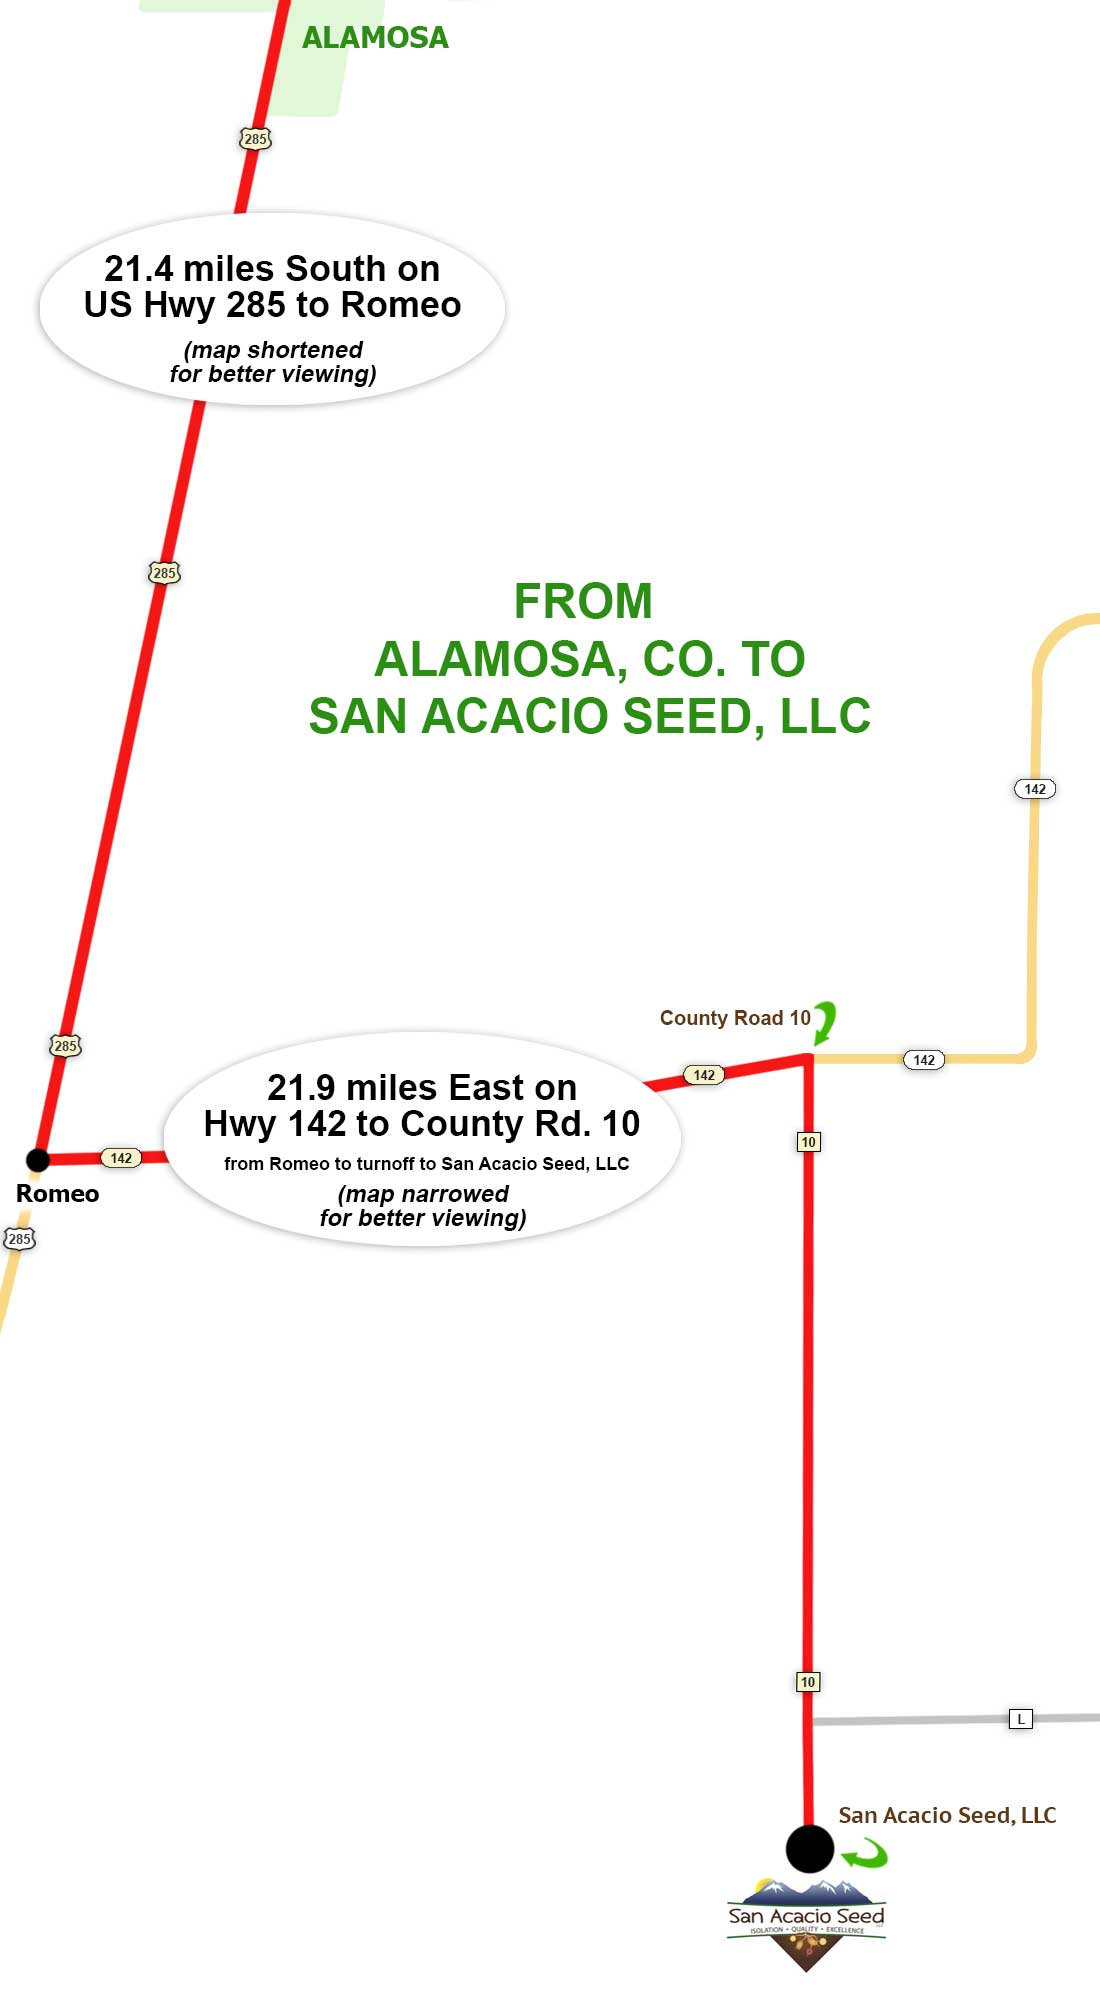 Alamosa, Colorado to San Acacio Seed, LLC